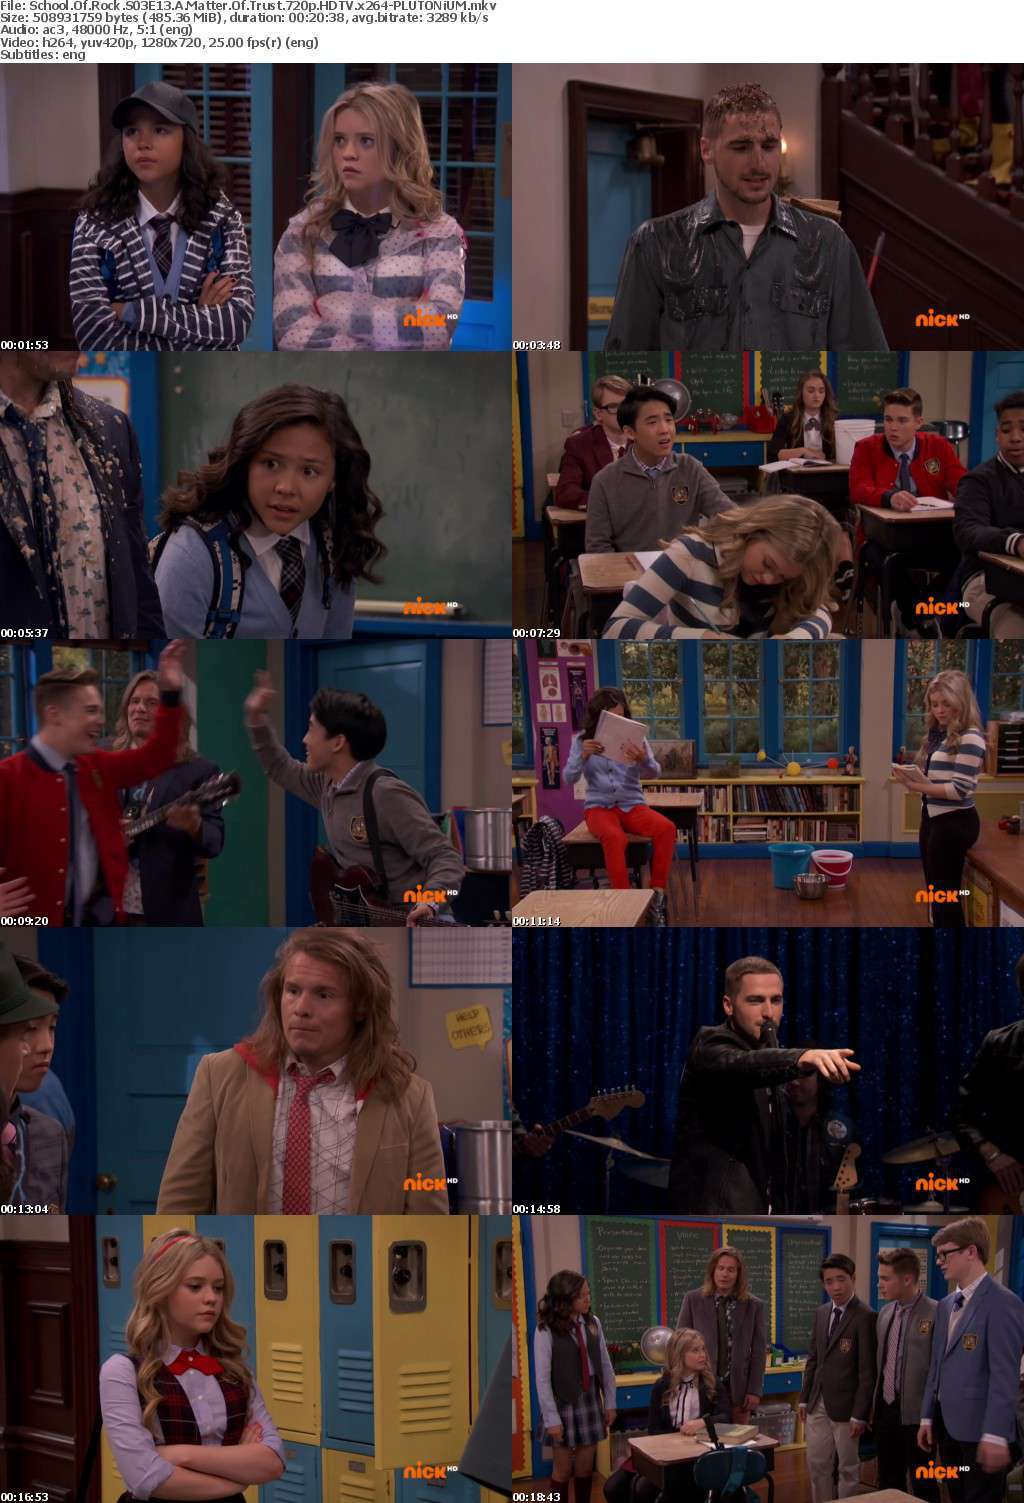 School Of Rock S03E13 A Matter Of Trust 720p HDTV x264-PLUTONiUM